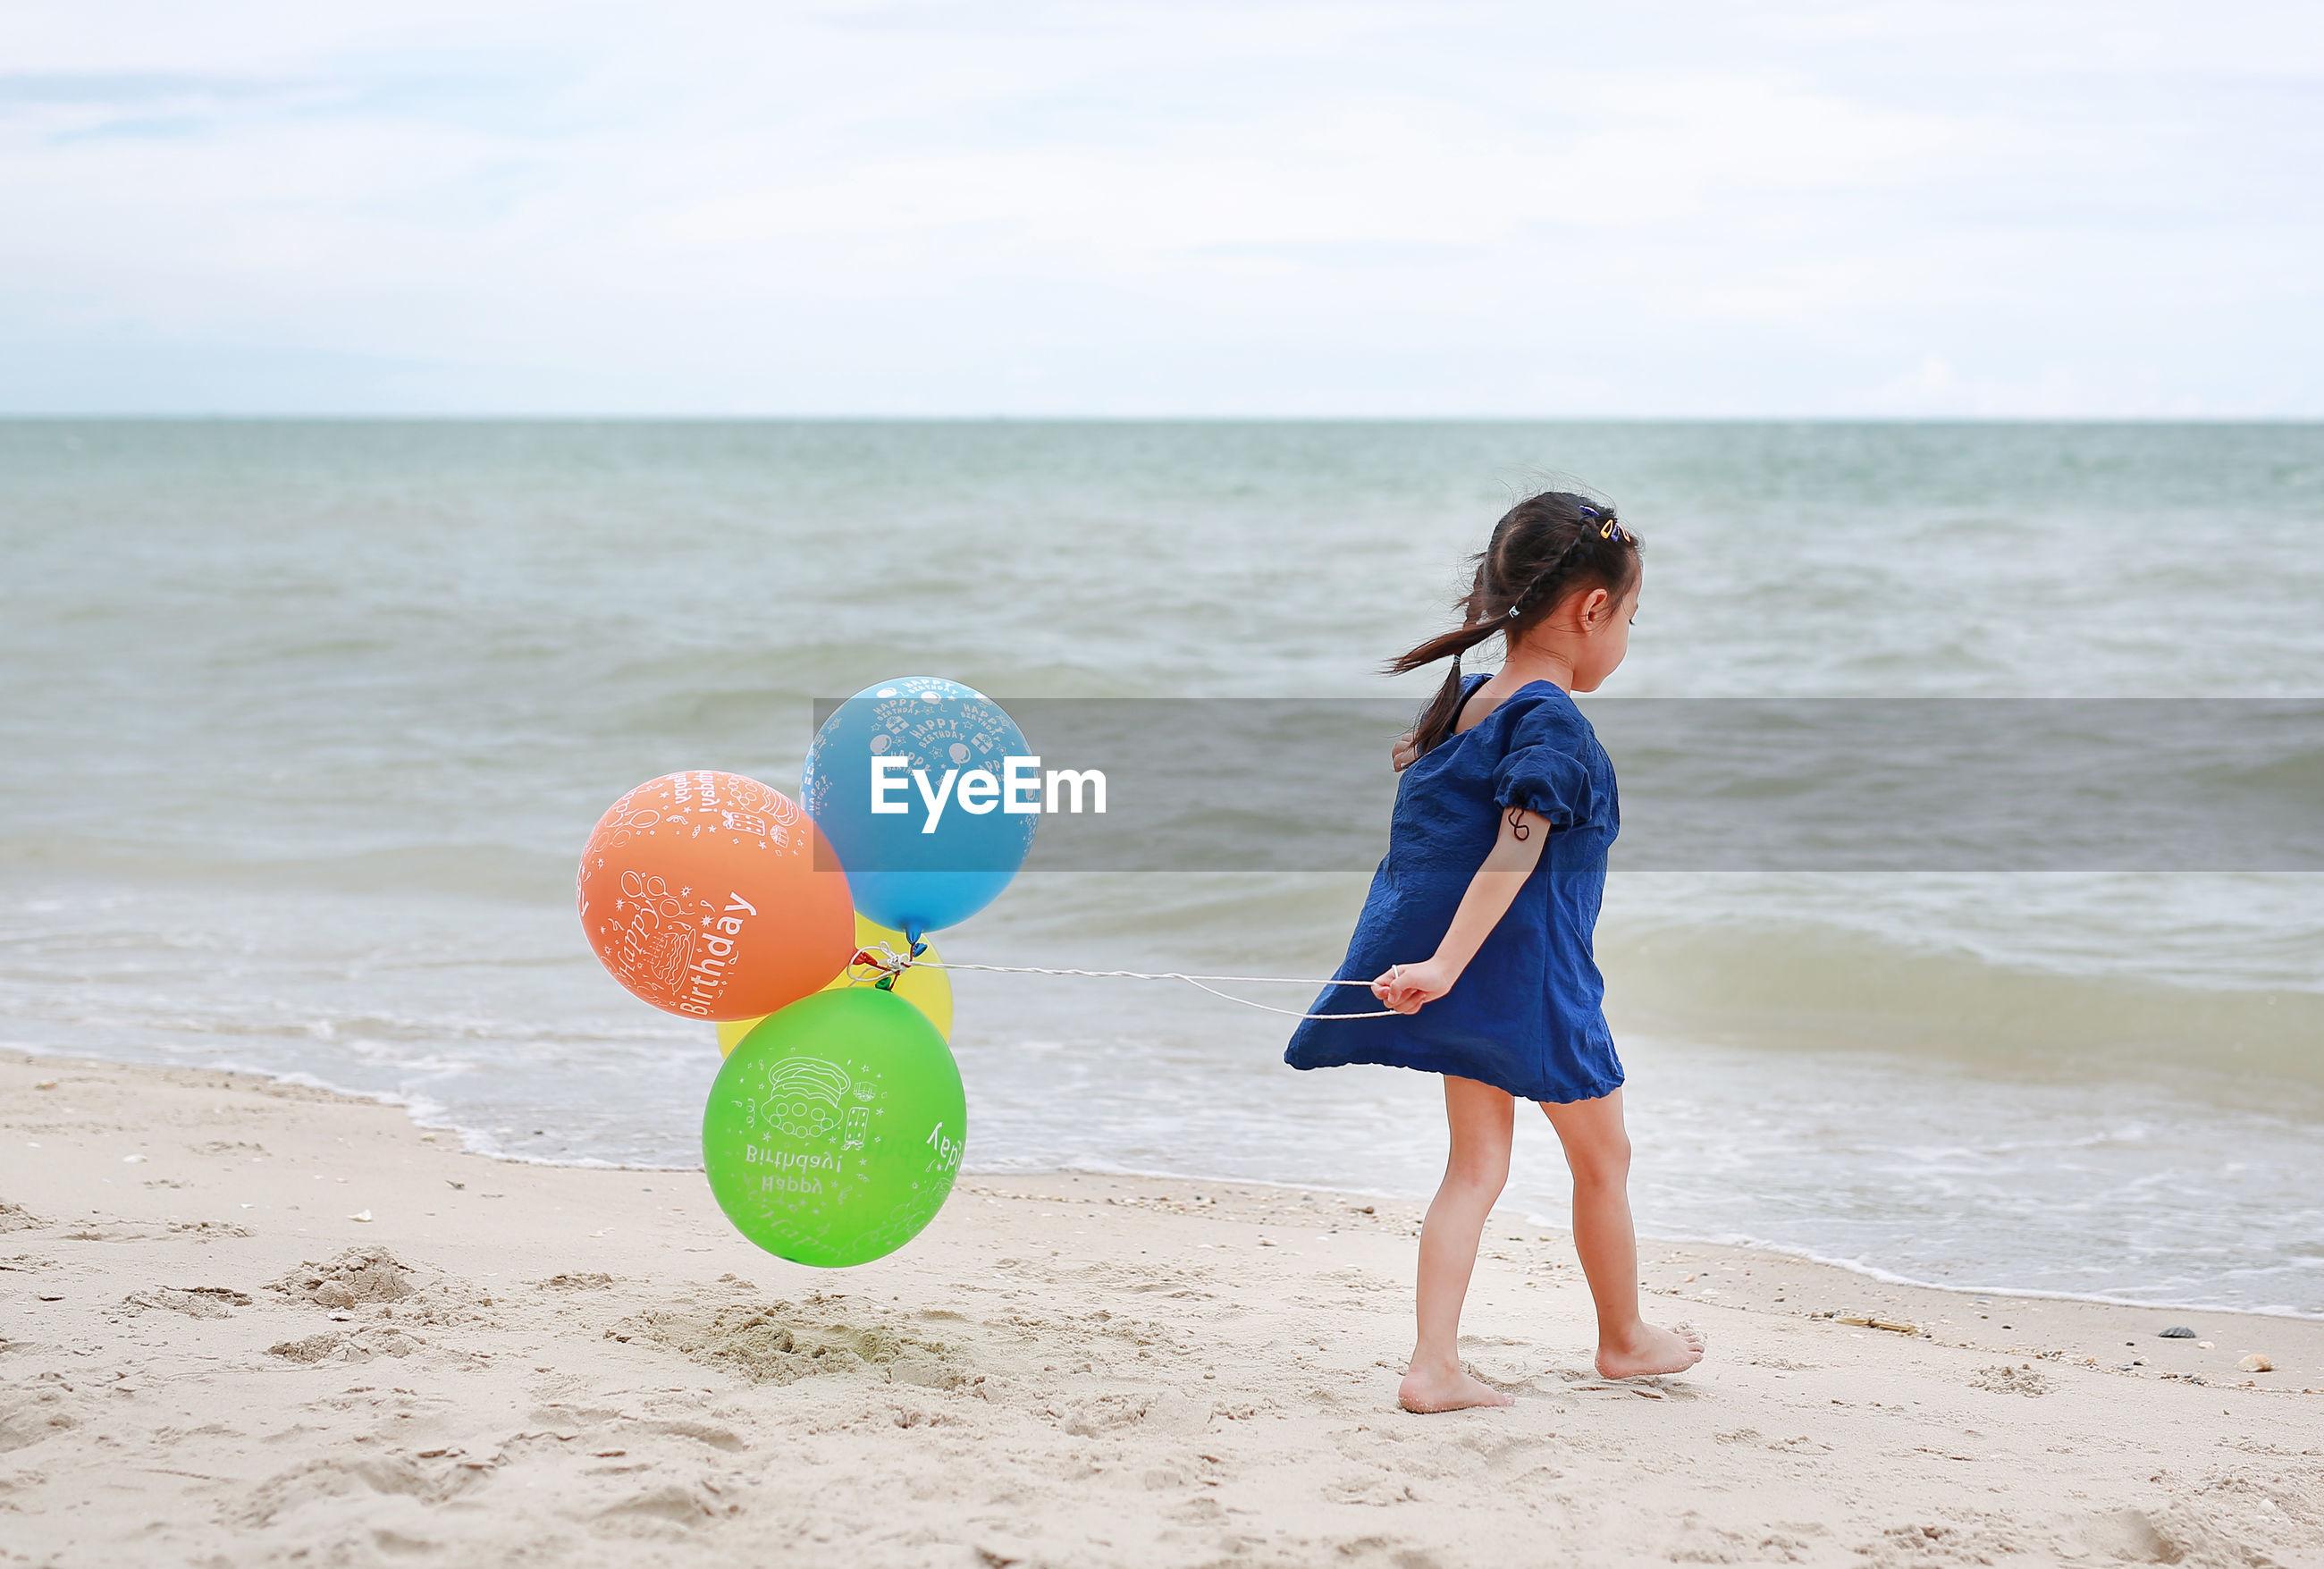 Girl with balloons walking at beach